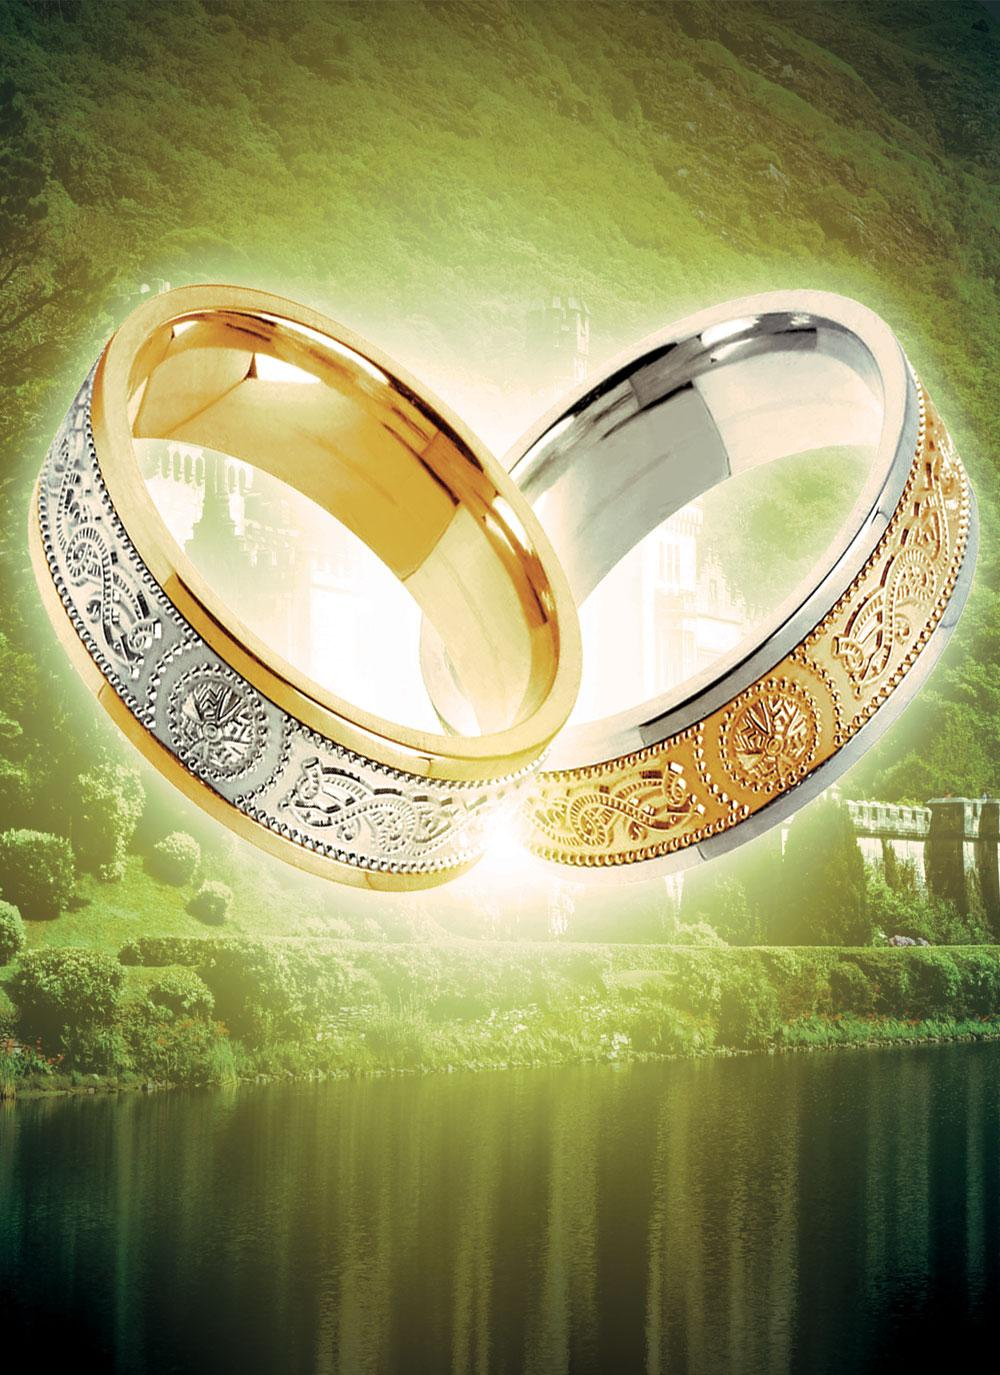 ladies 10k gold signature wedding band blarney